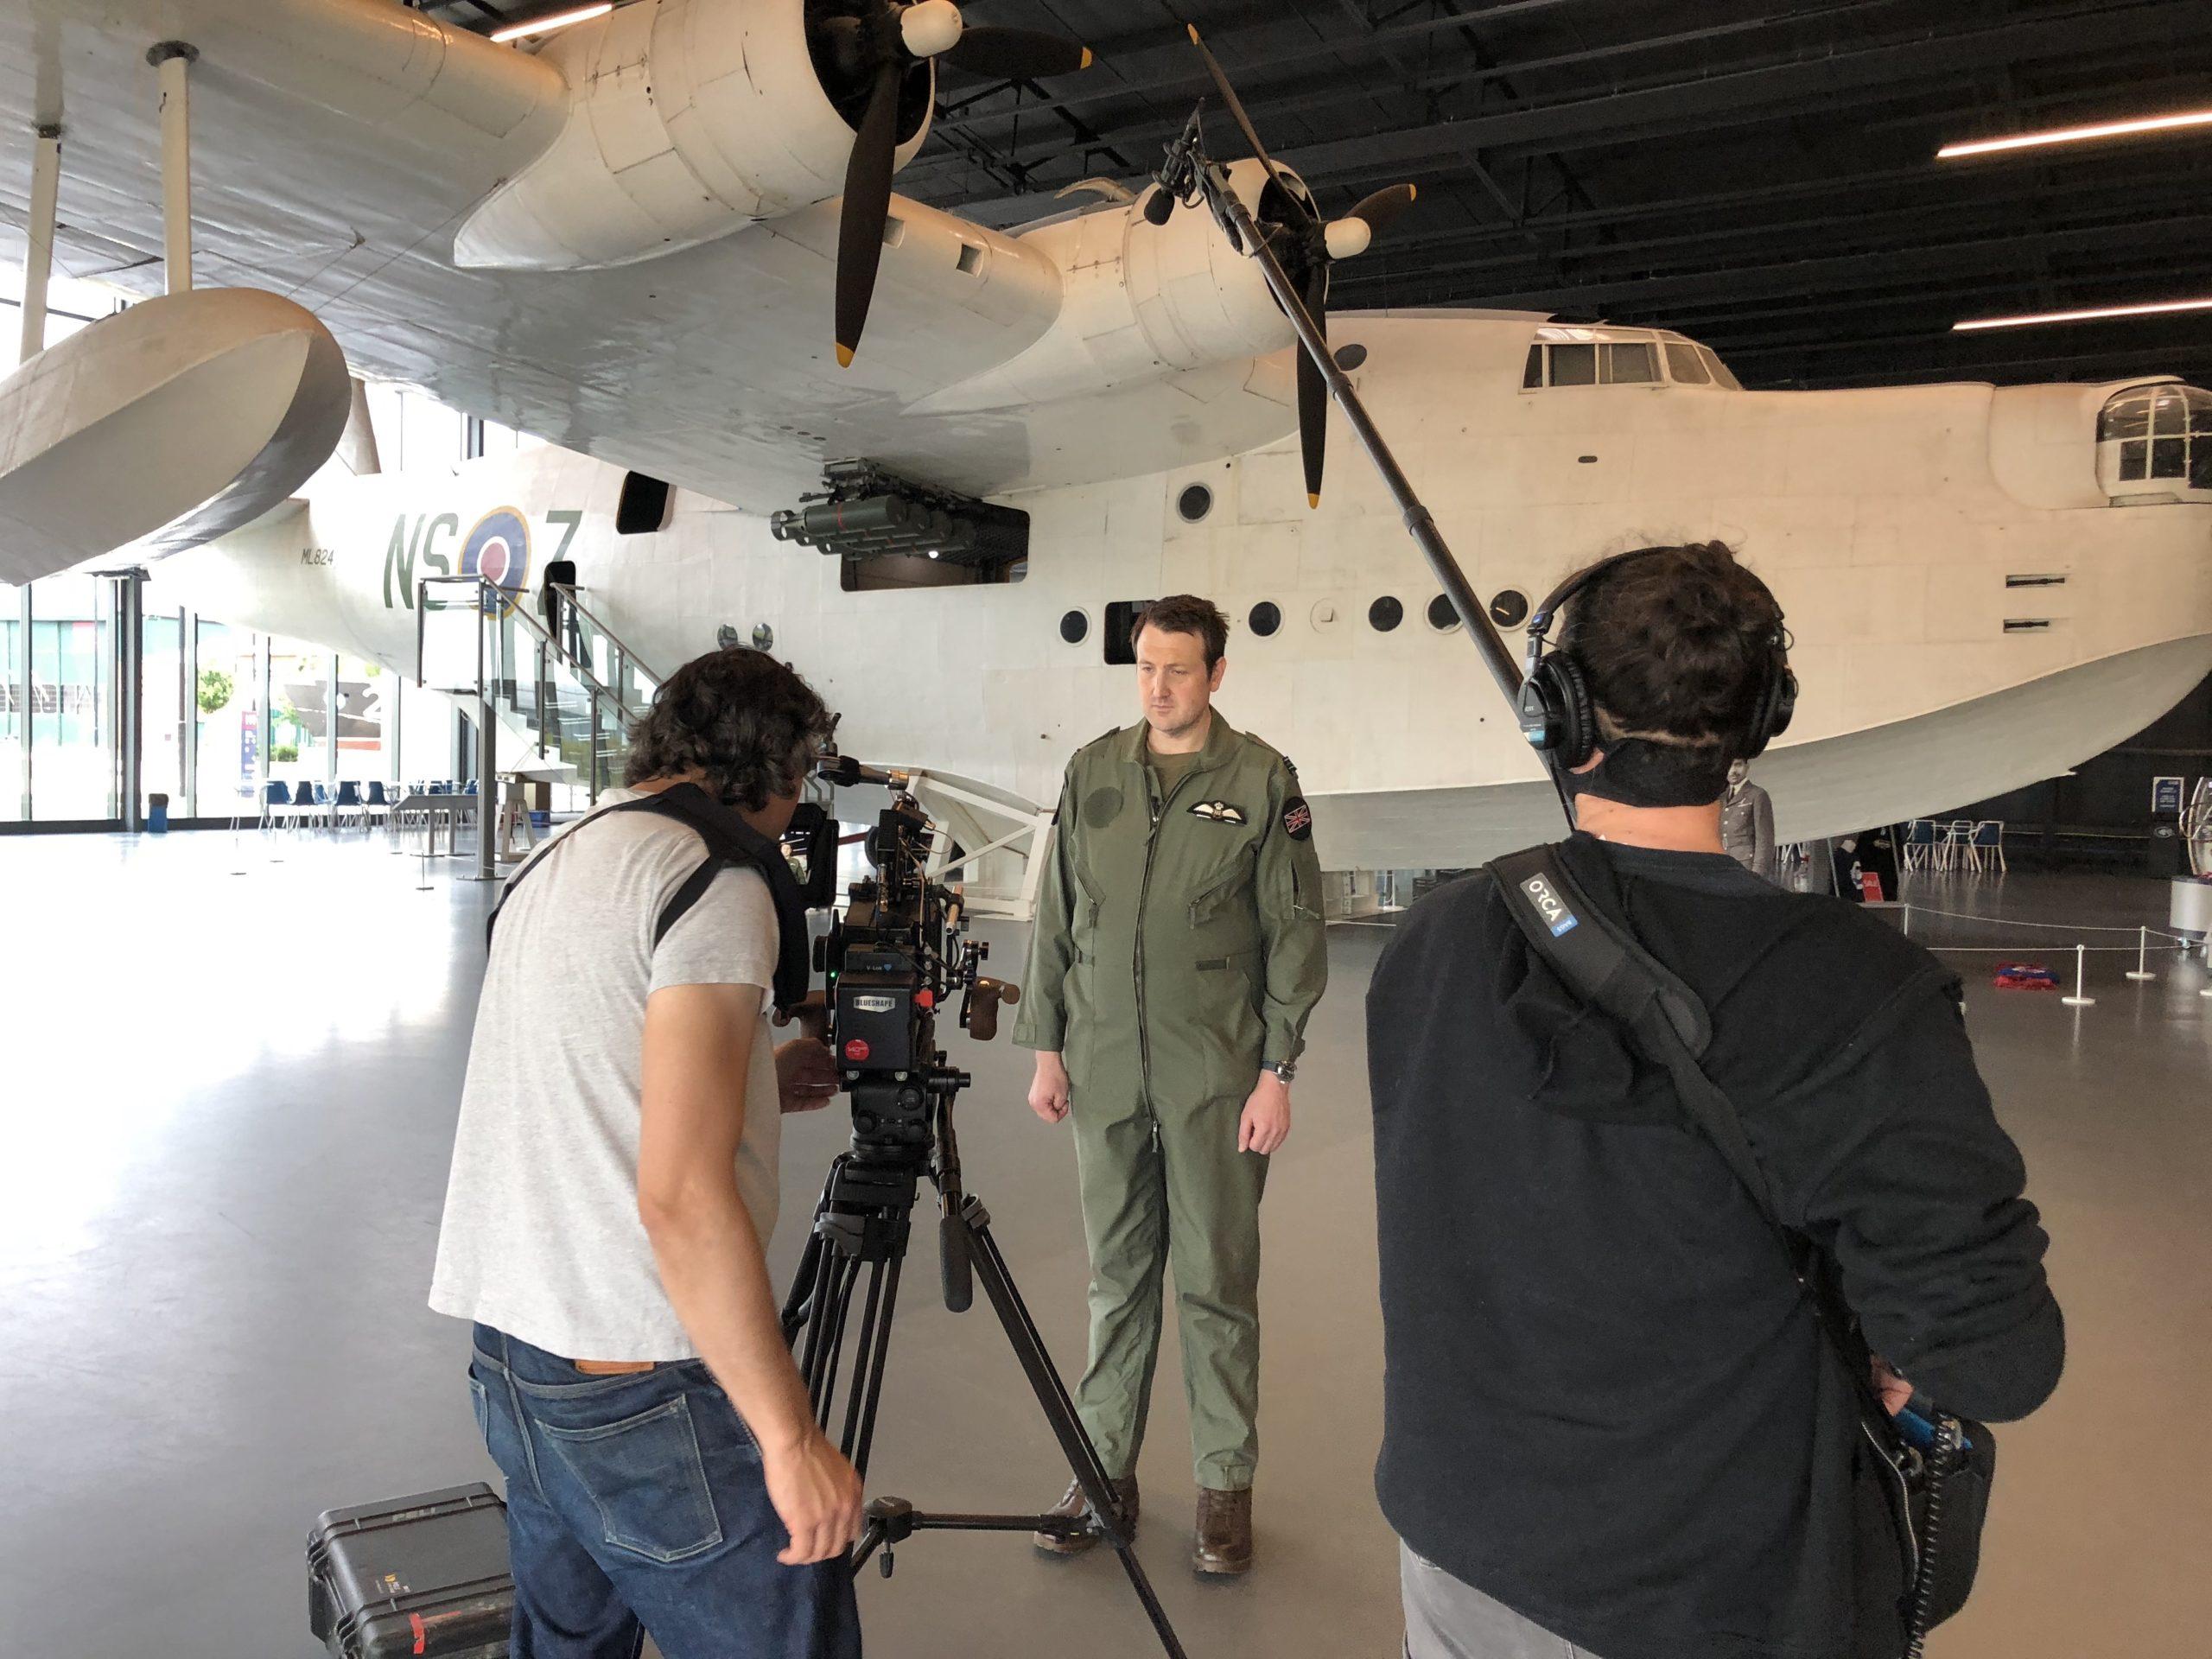 man being filmed in front of RAF plane